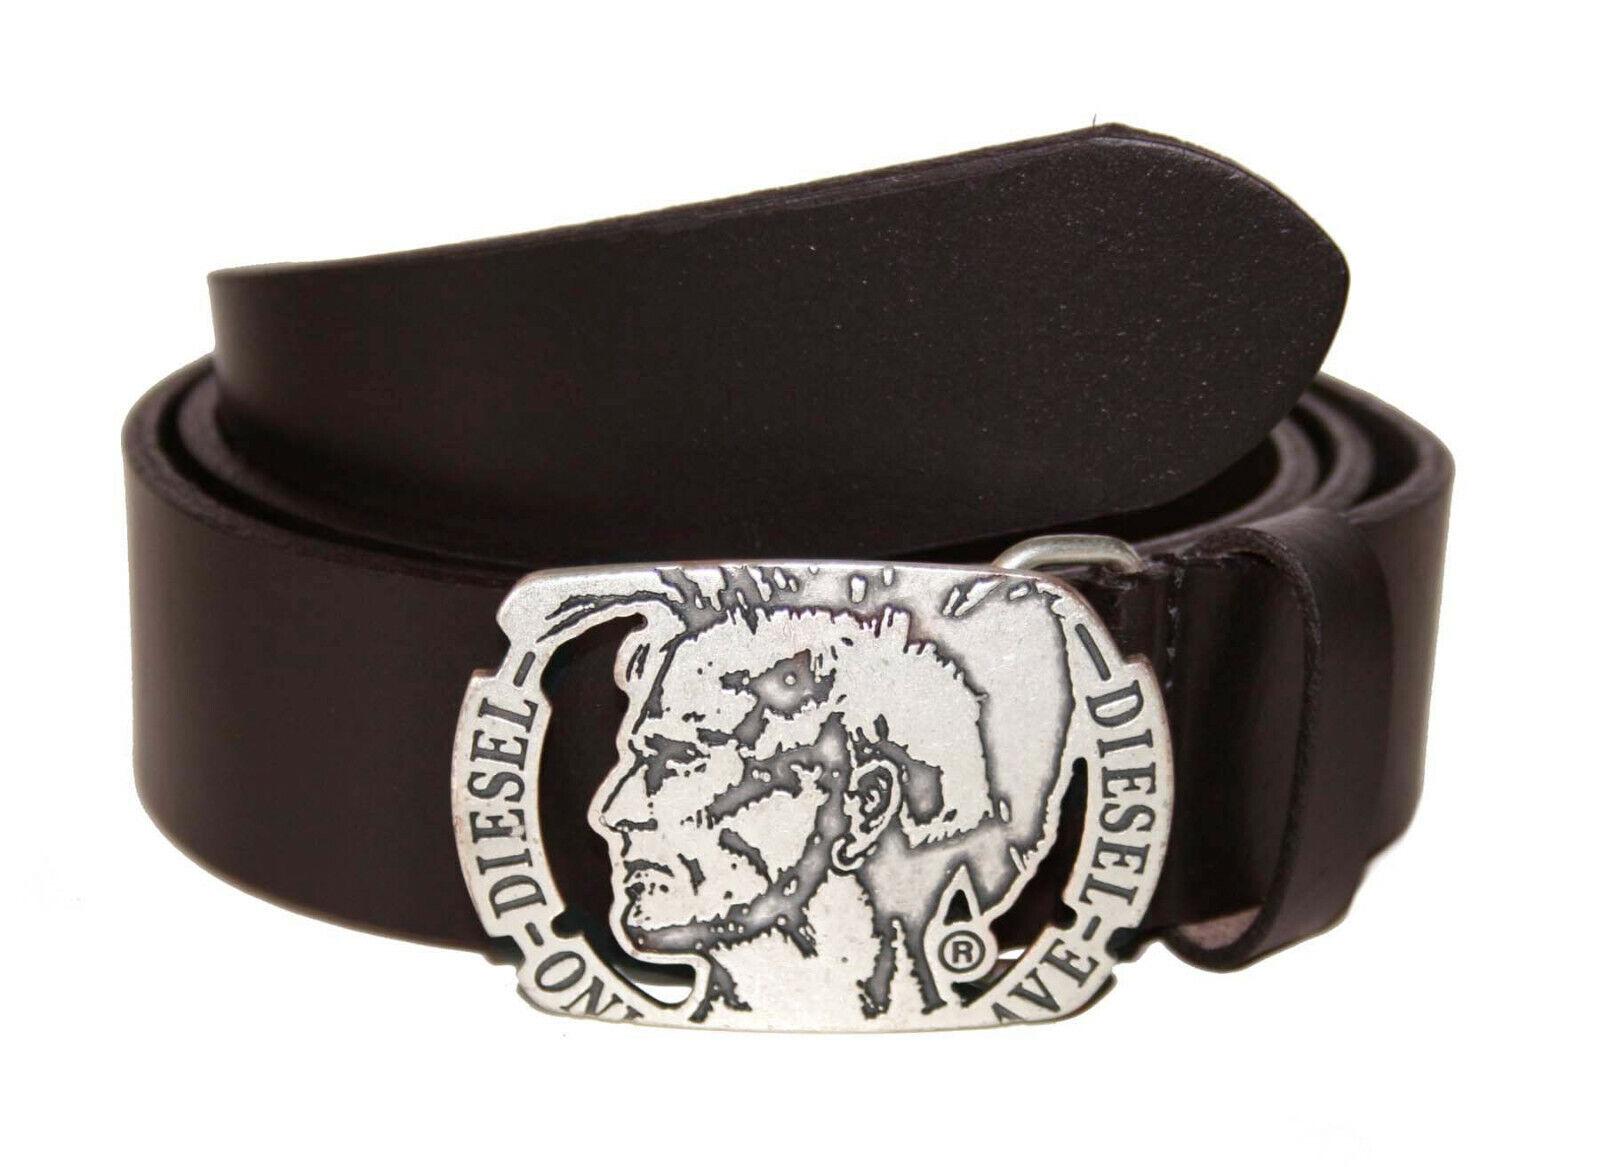 Diesel Belt Leather Belt Leather Belt Size 90